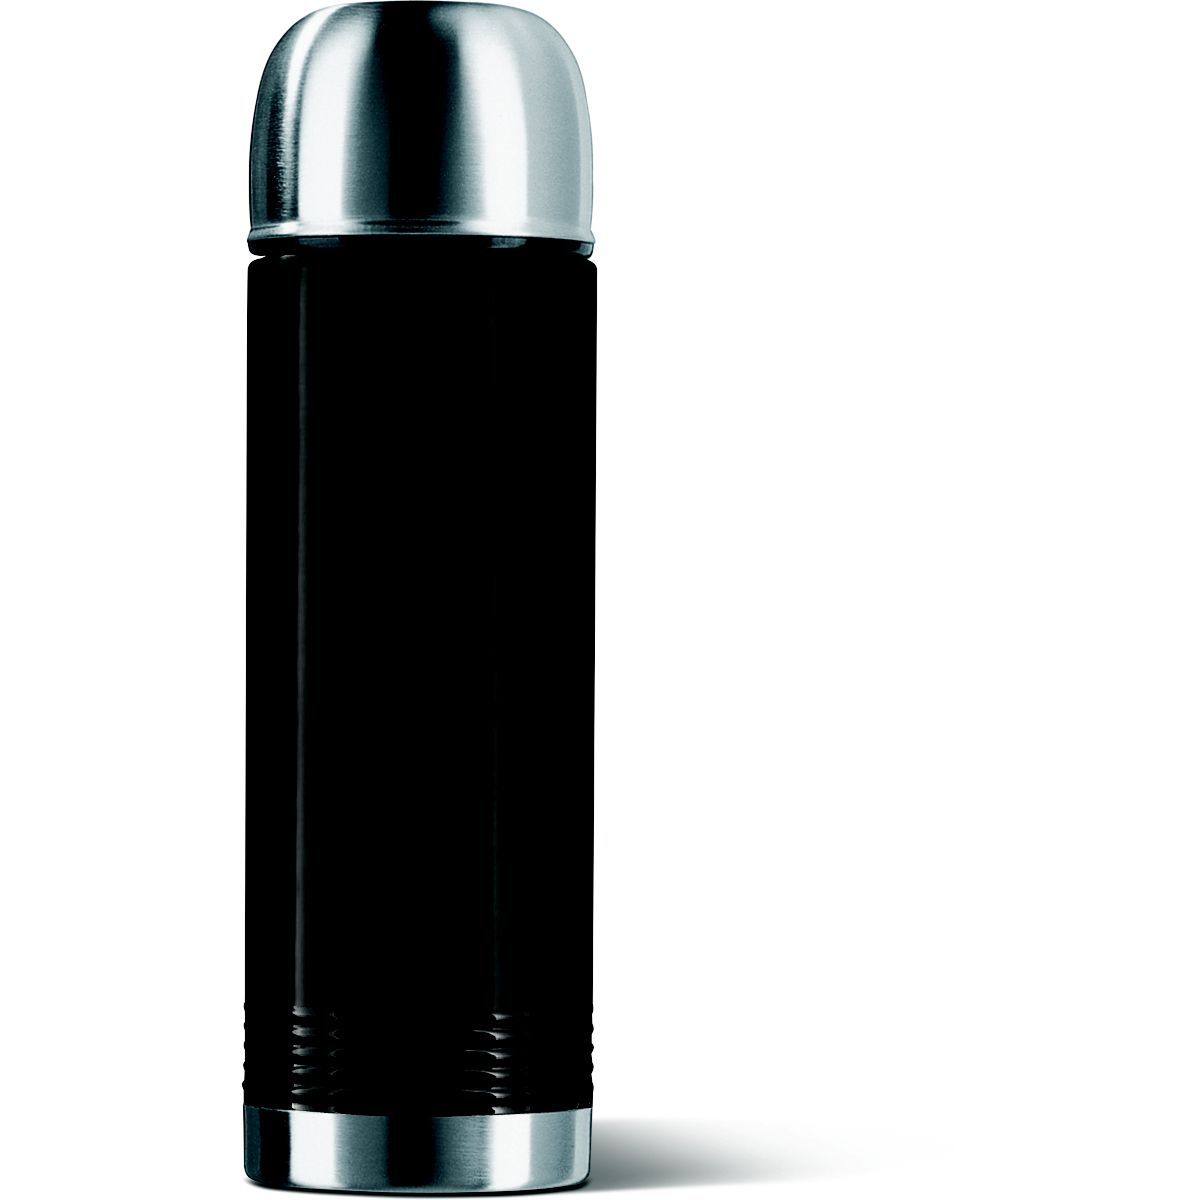 Bouteille isotherme EMSA isotherme noir 0.7L